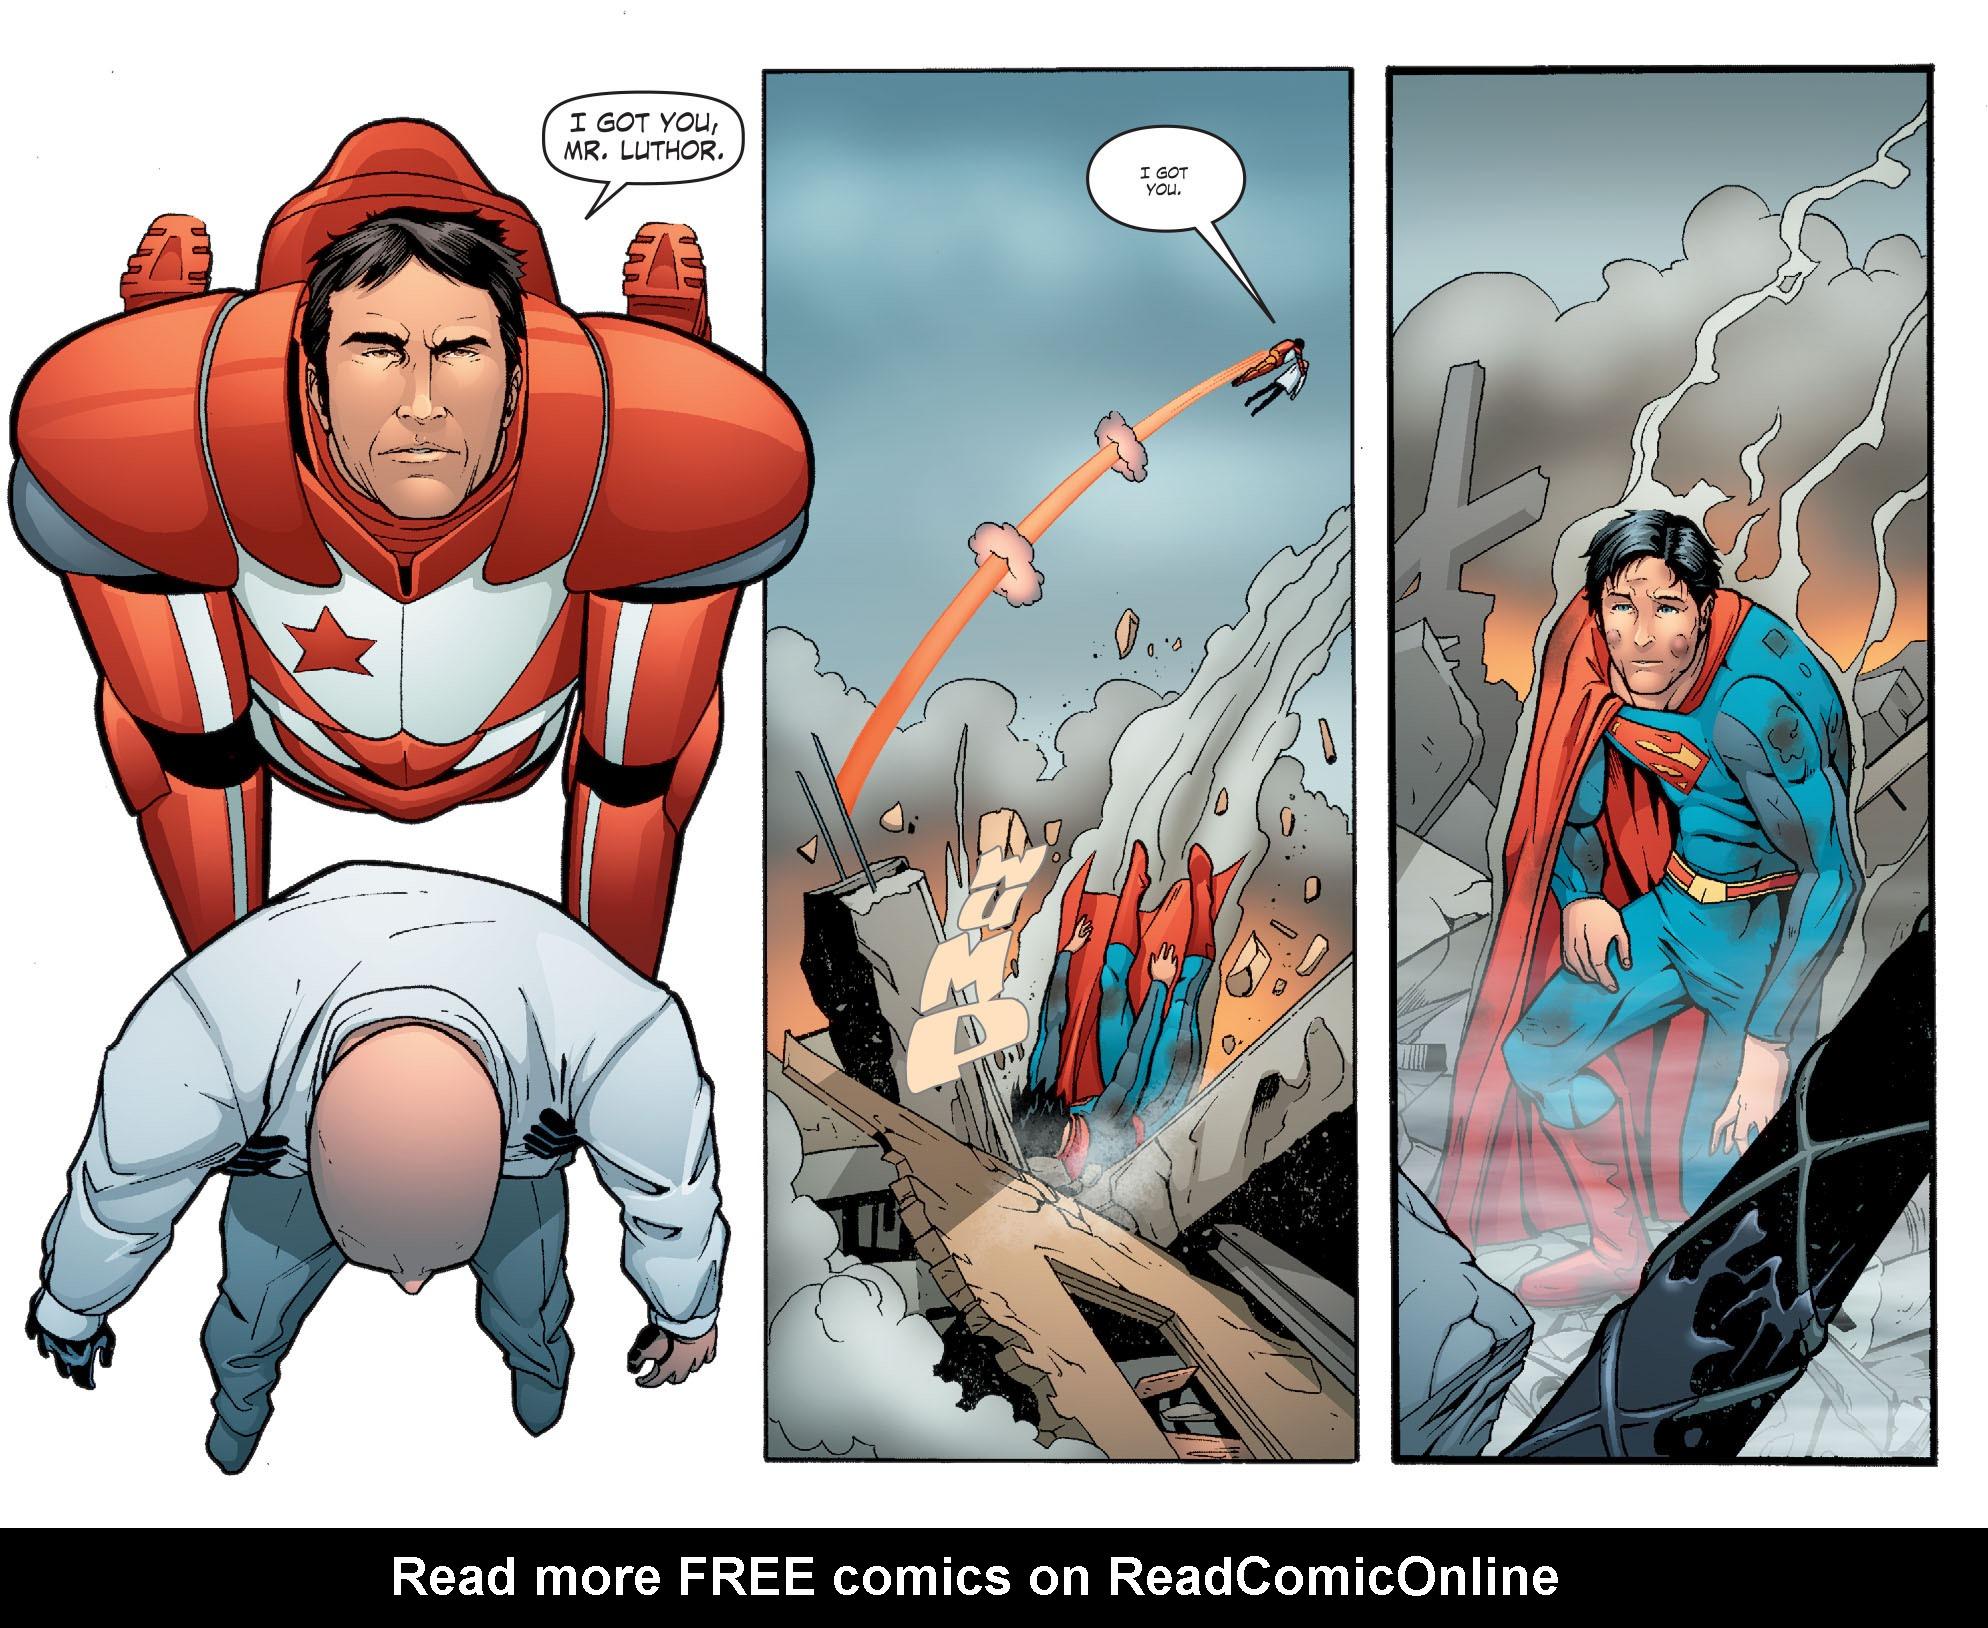 Read online Smallville: Alien comic -  Issue #11 - 21